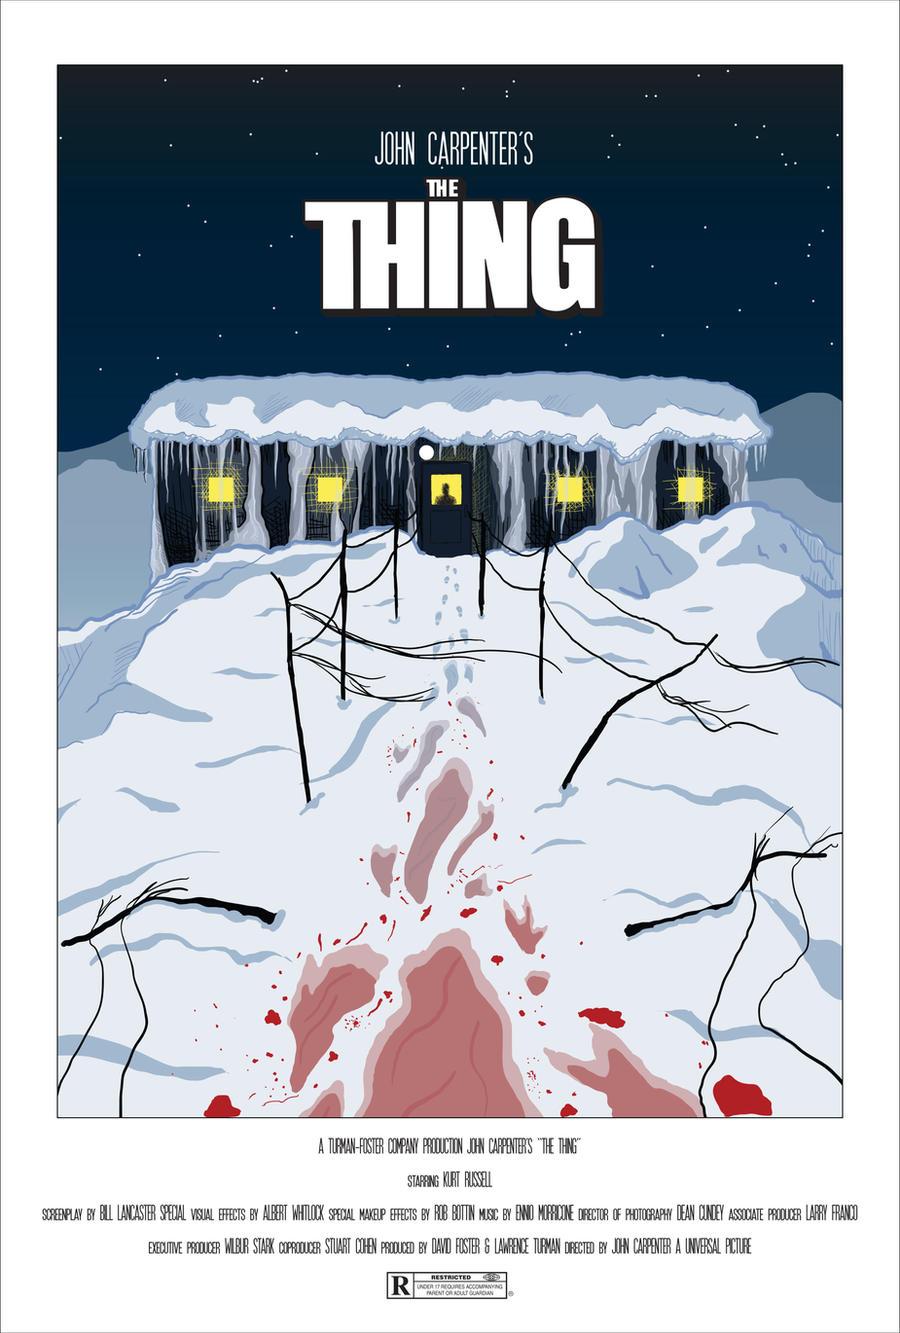 Poster design john foster - John Carpenter S The Thing Poster By Evanlamedicaart John Carpenter S The Thing Poster By Evanlamedicaart